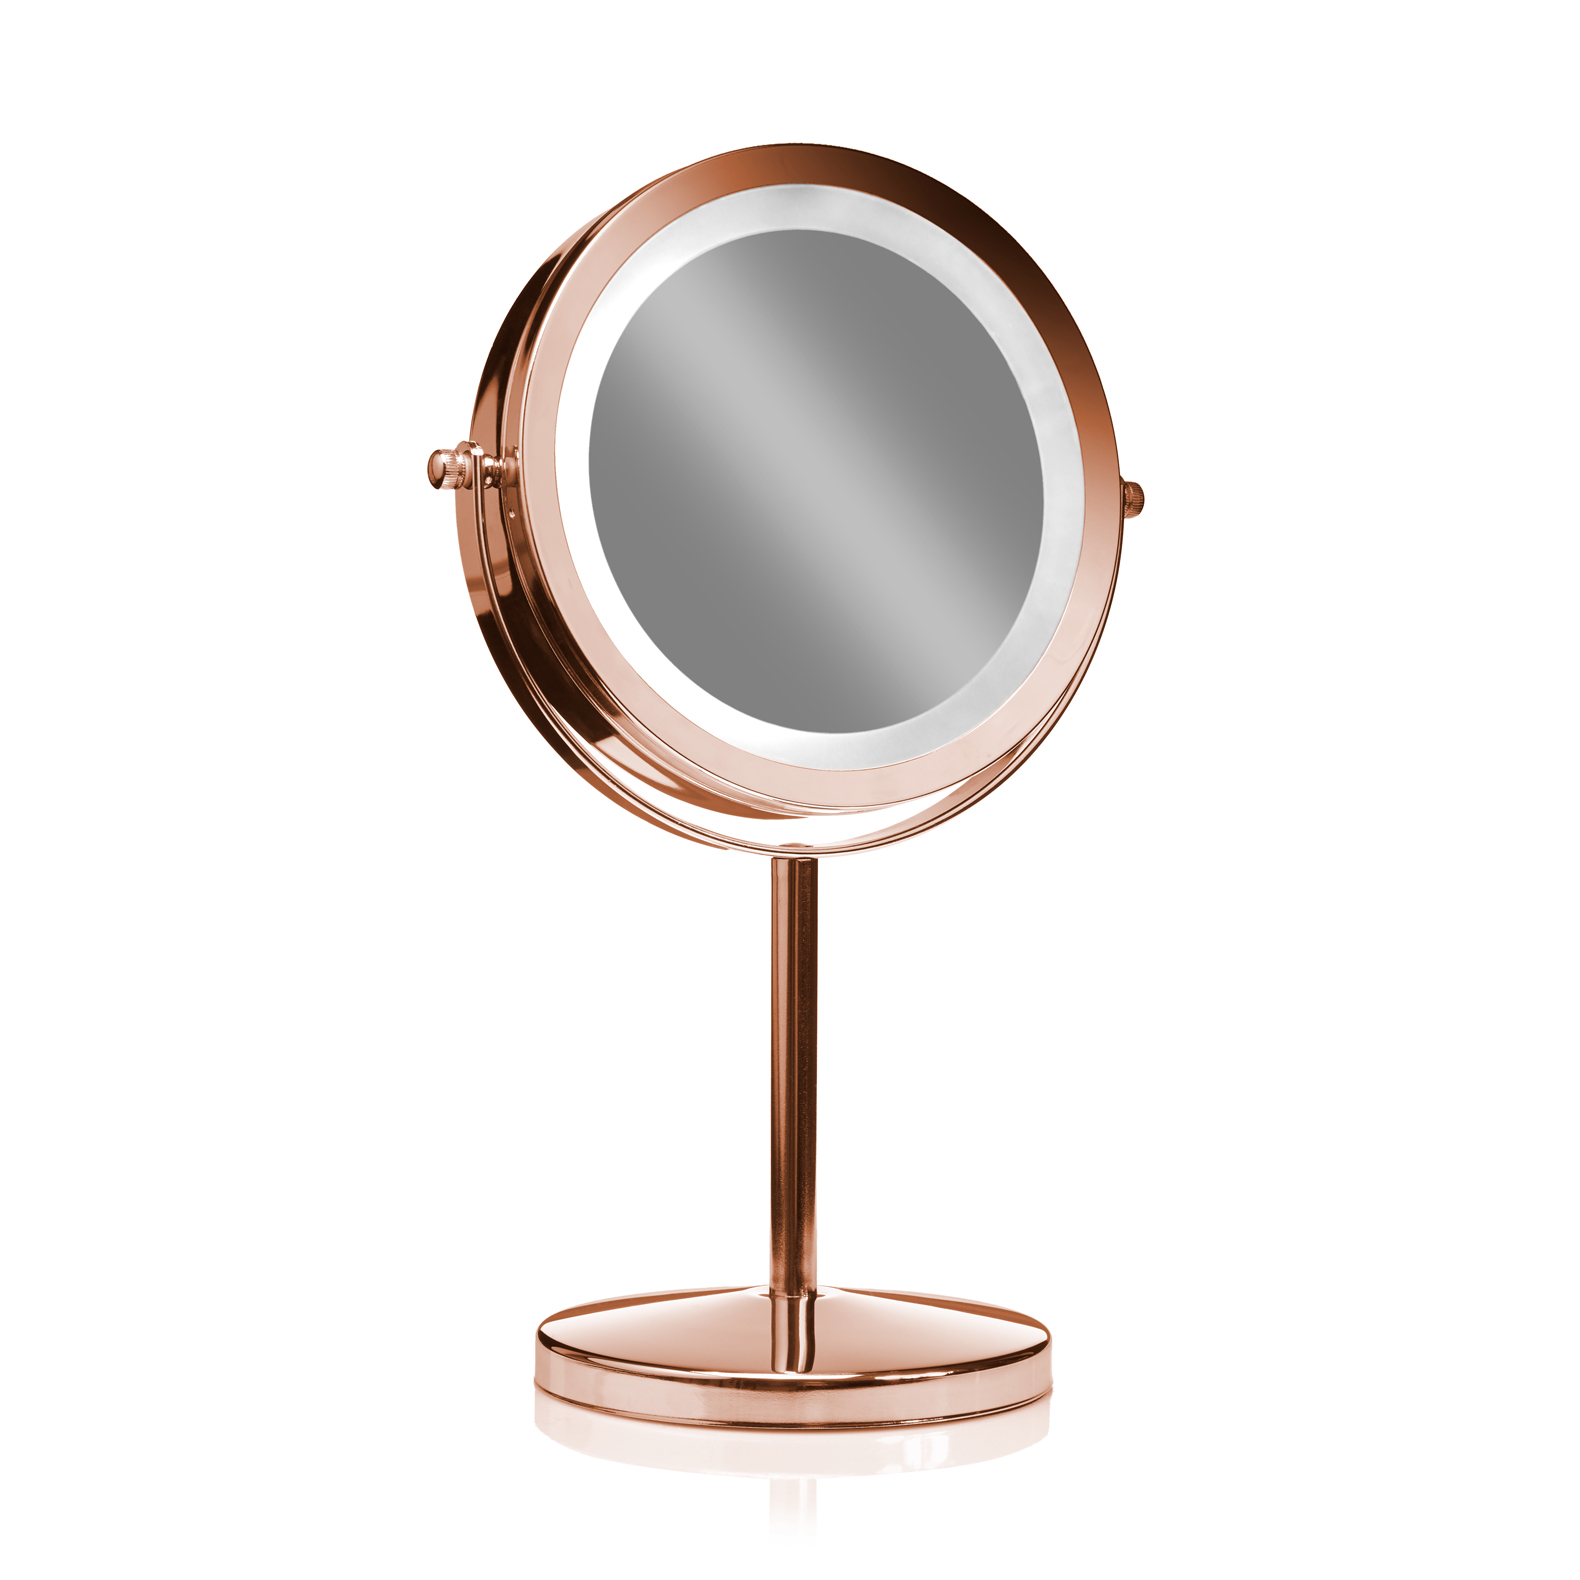 Gillian Jones Bordspejl med LED lys